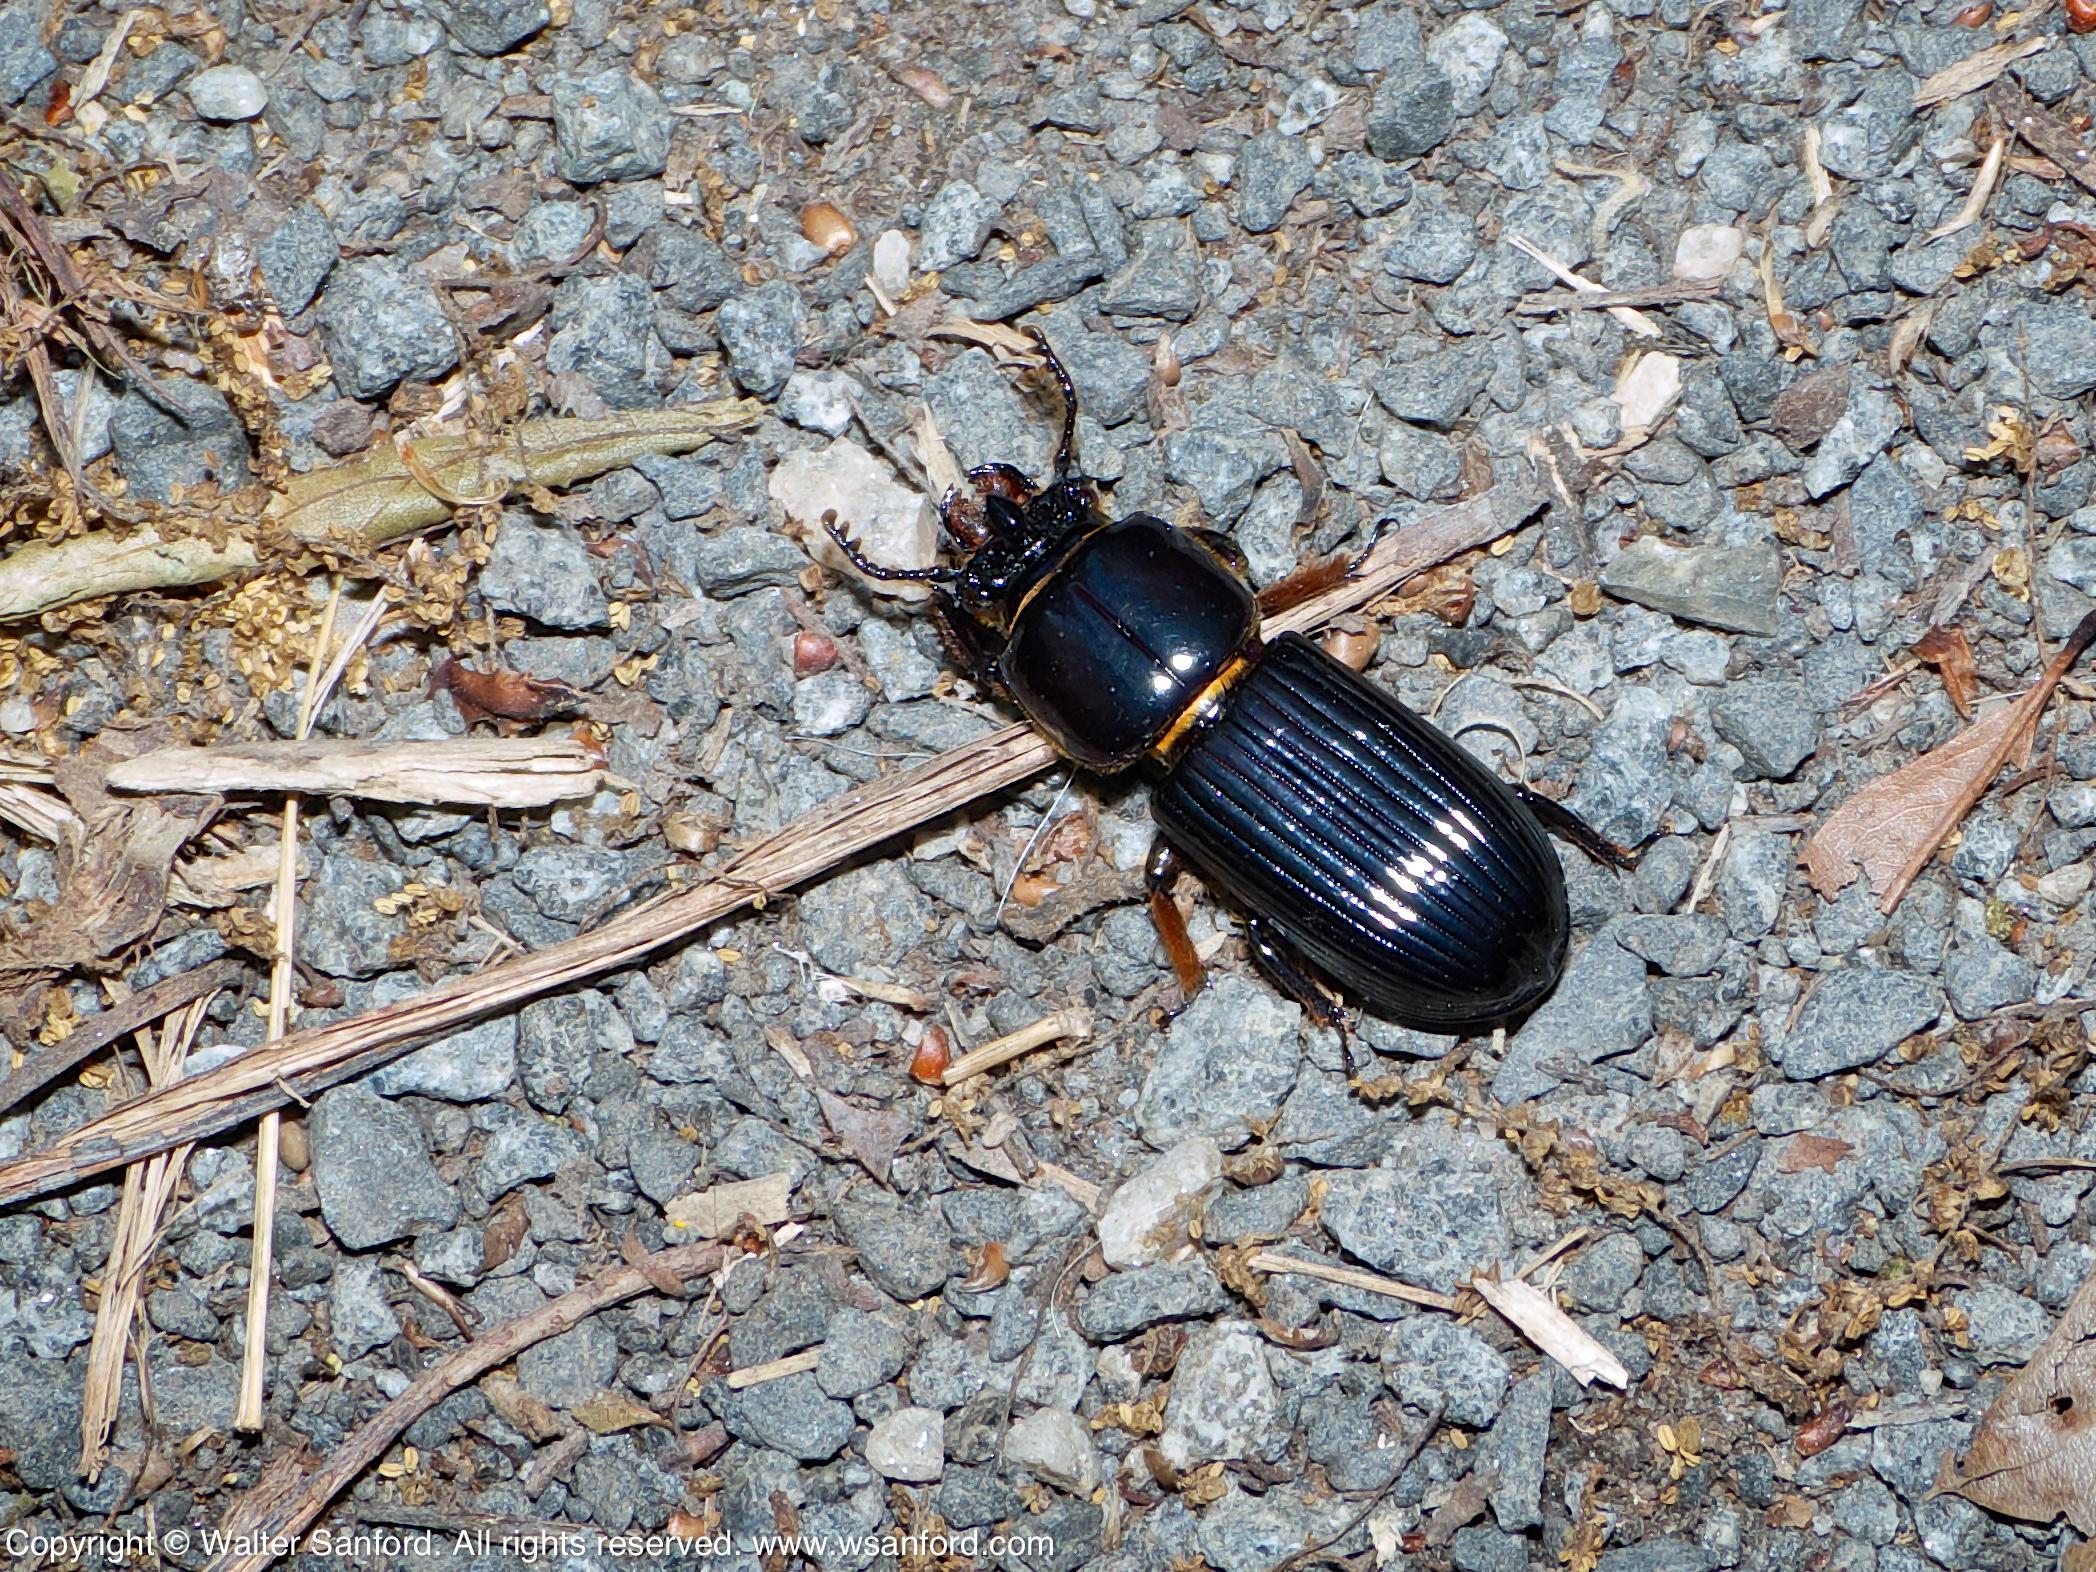 Meet the Beetles, Part 1 – Bess Beetle and Stag Beetle